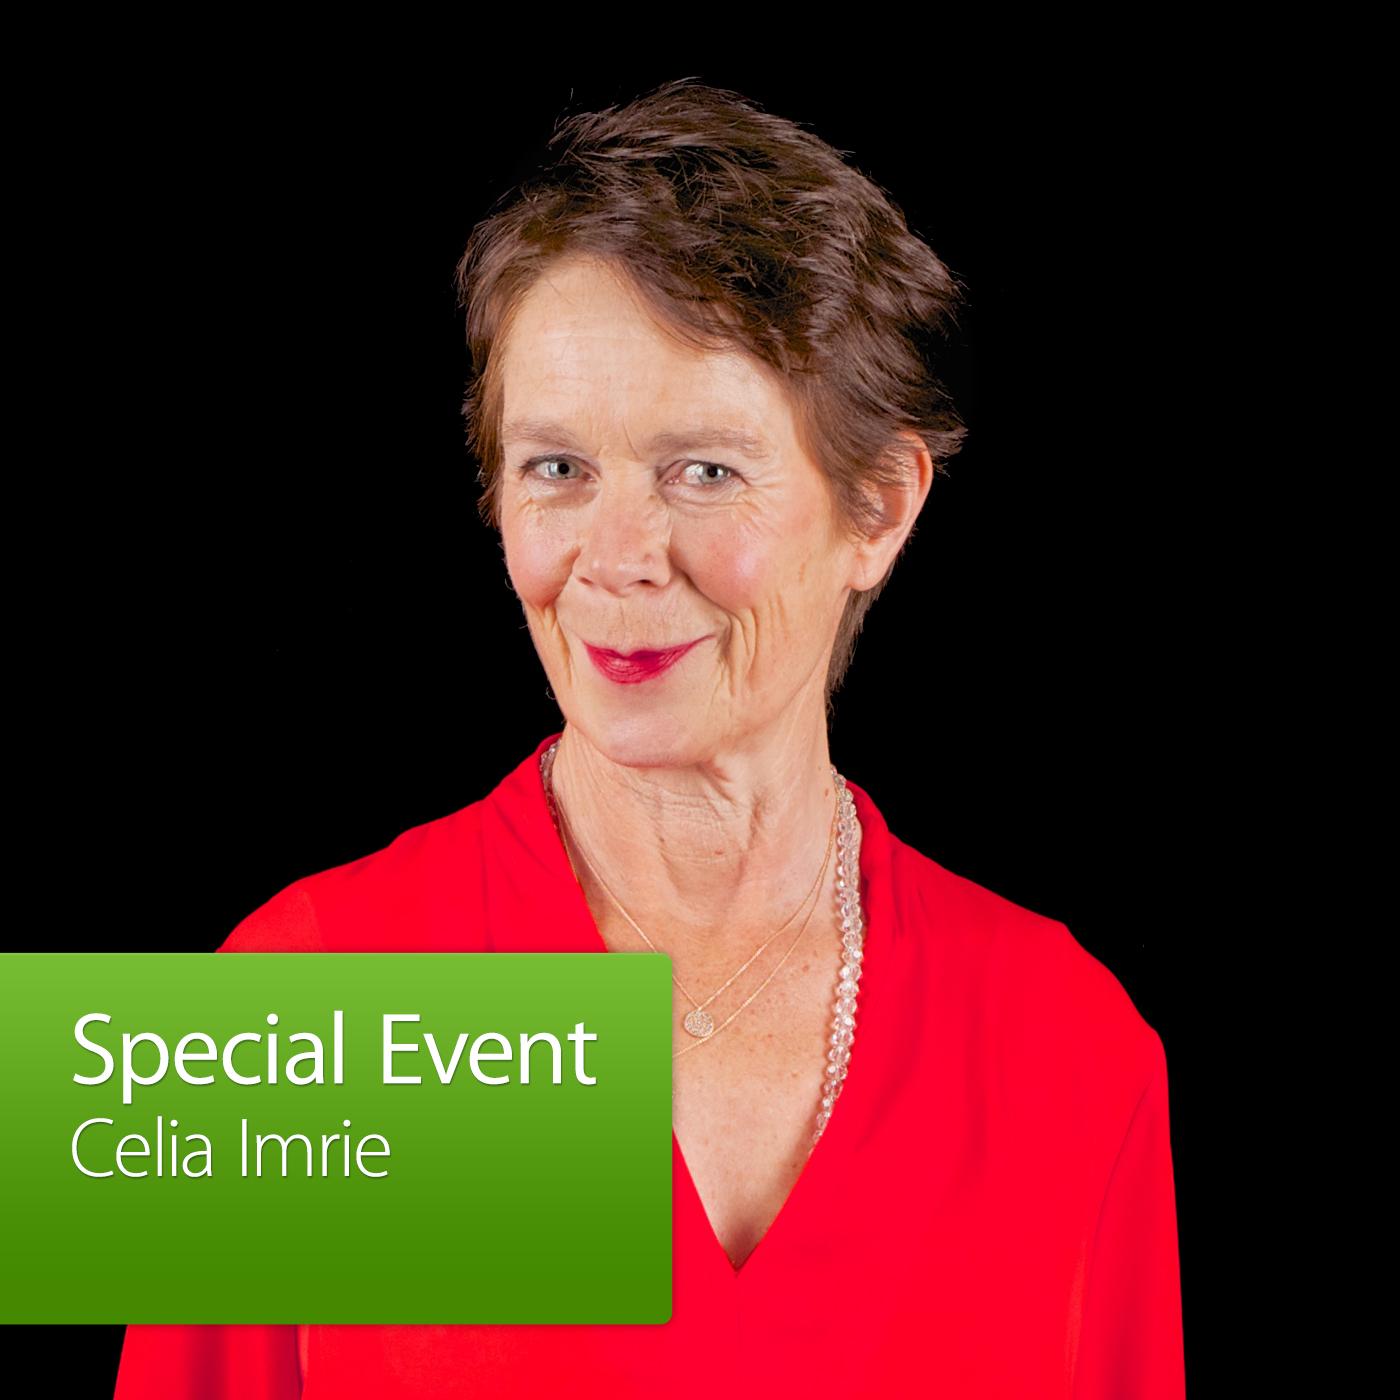 Celia Imrie: Special Event